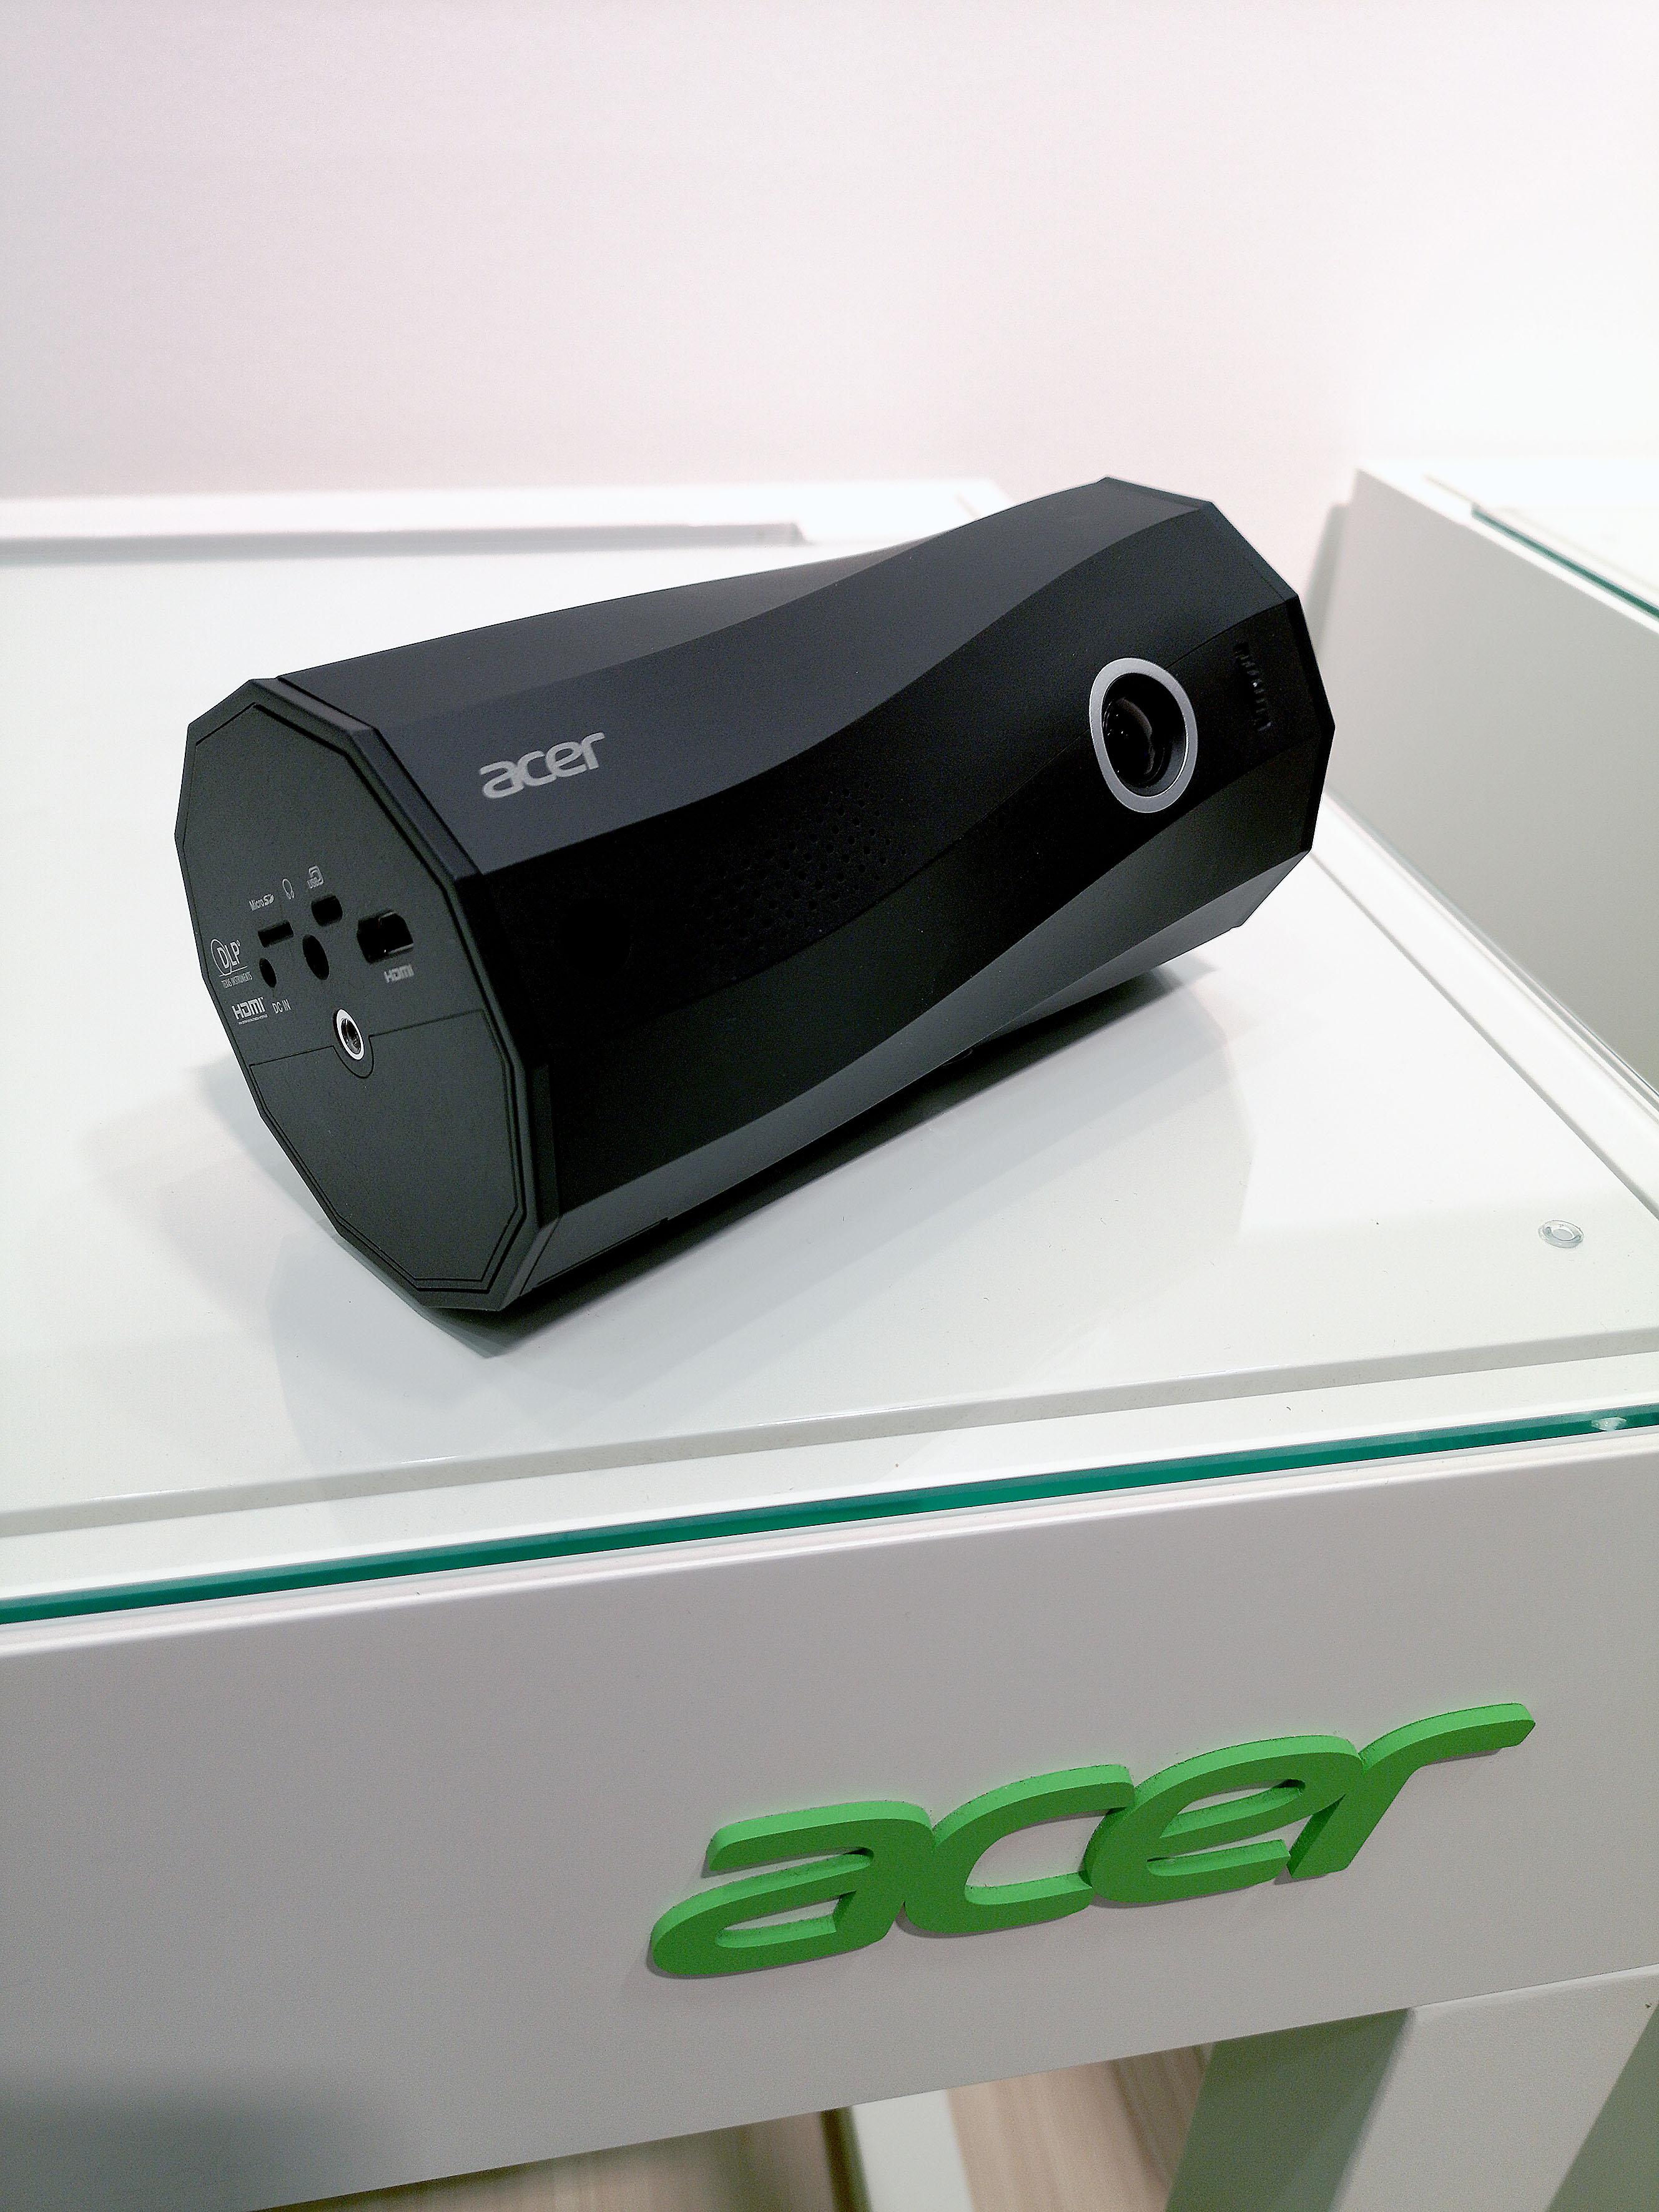 Foto: Michael B. Rehders - Acer C250i - portabler LED-Projektor für 399,- Euro